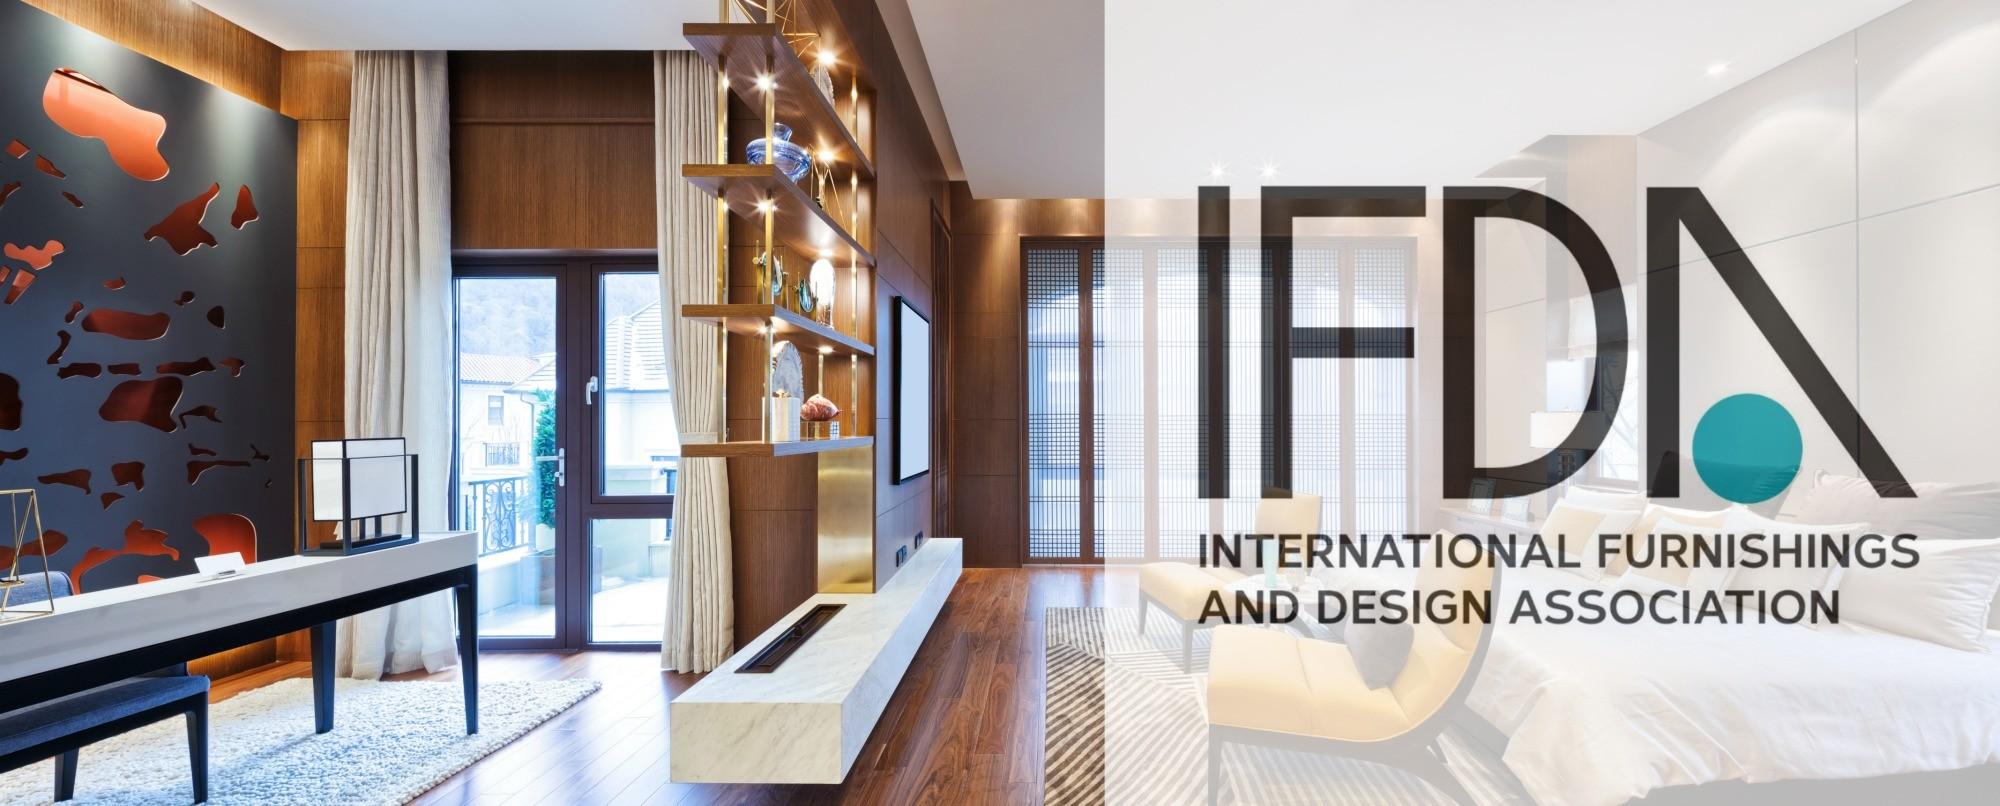 Ifda International Furnishings And Design Association Linkedin